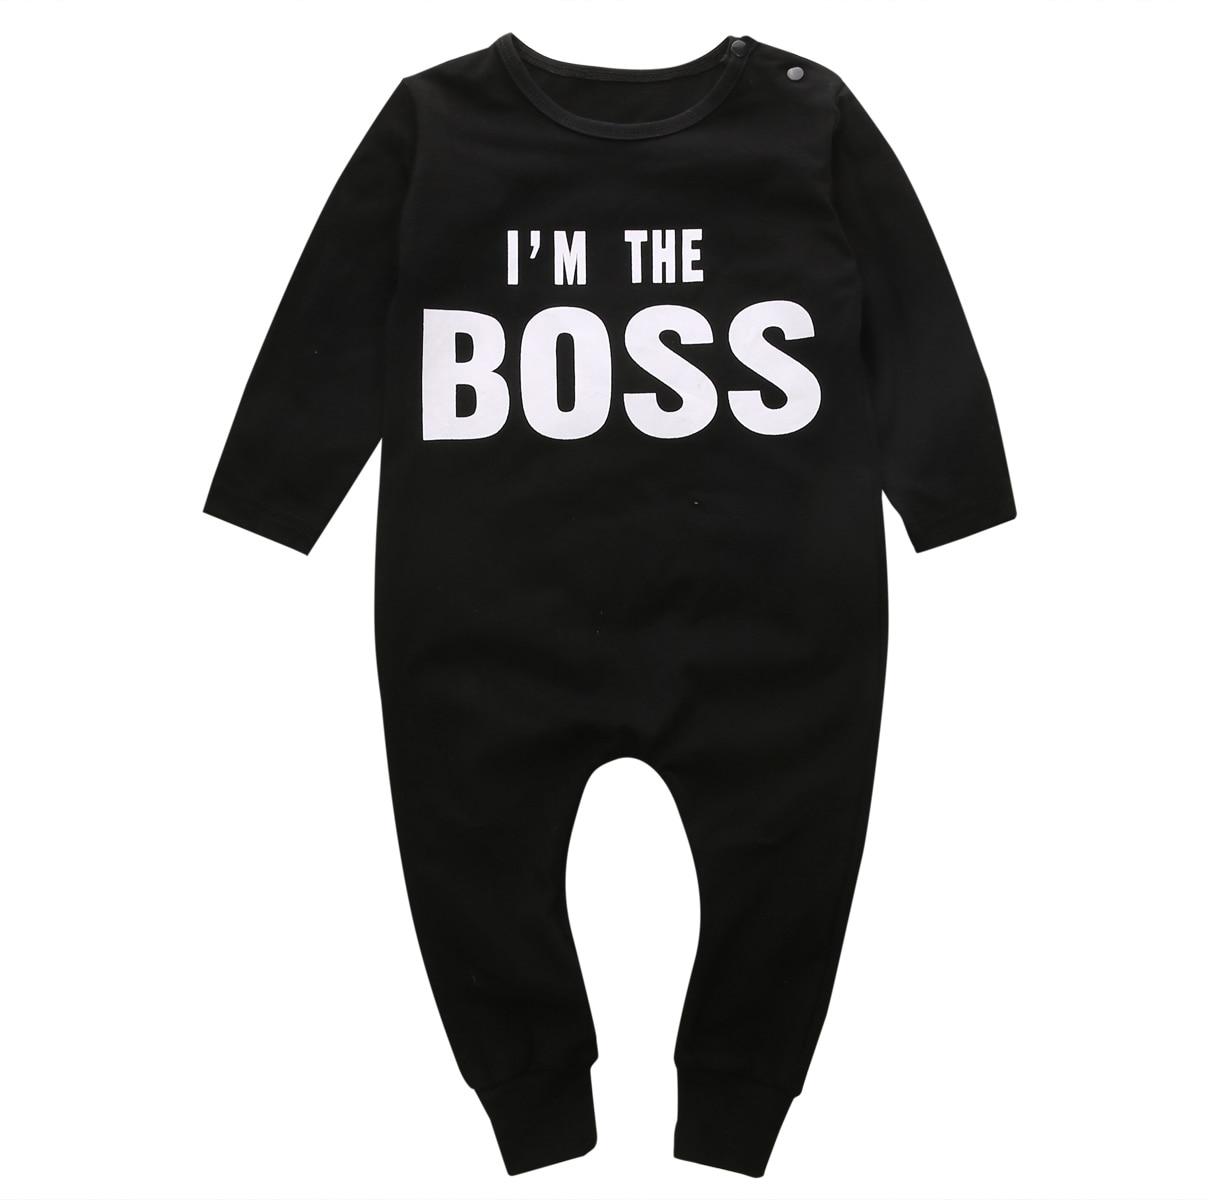 2016 Autumn Baby Boy Warm Romper Jumpsuit Outfits Clothes 6 12 18 24M newborn baby boy clothes baby boy romper newborn clothing 6 24m baby autumn